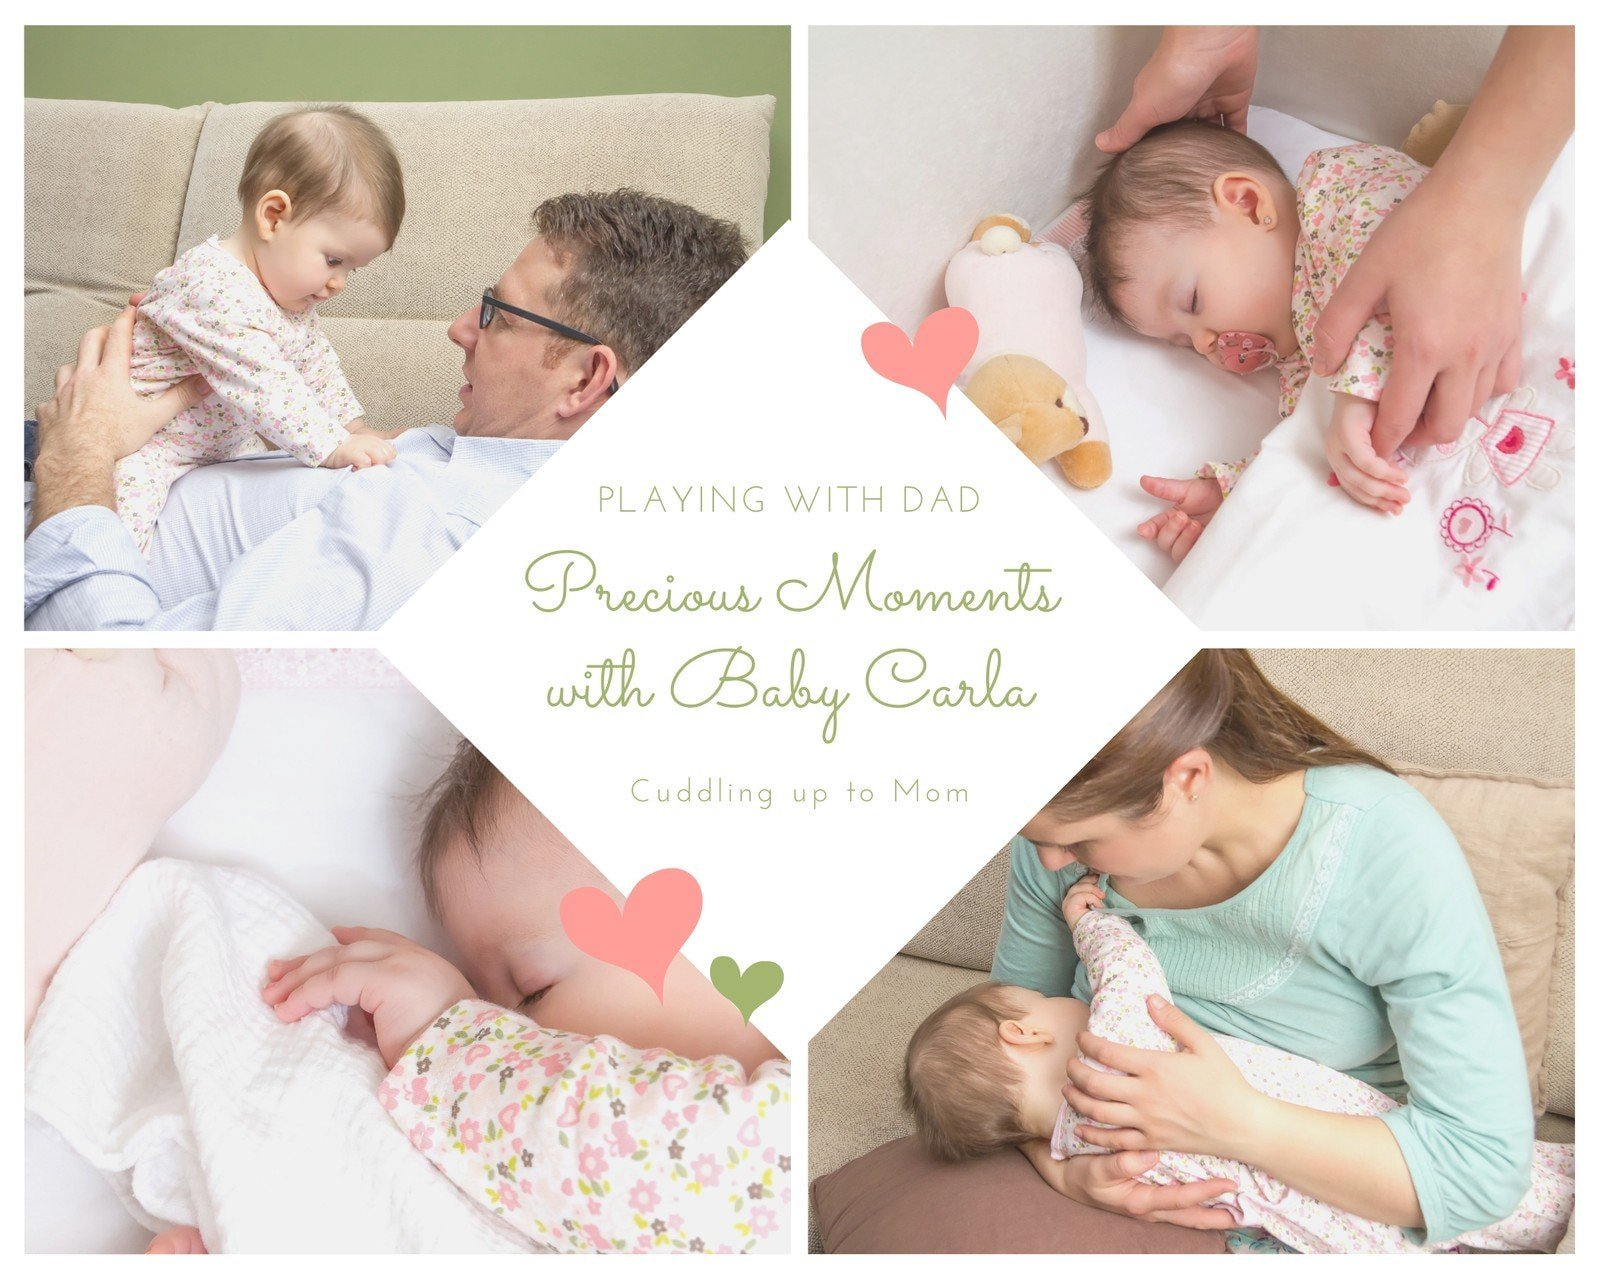 Cute Diamond Baby Girl Photo Collage